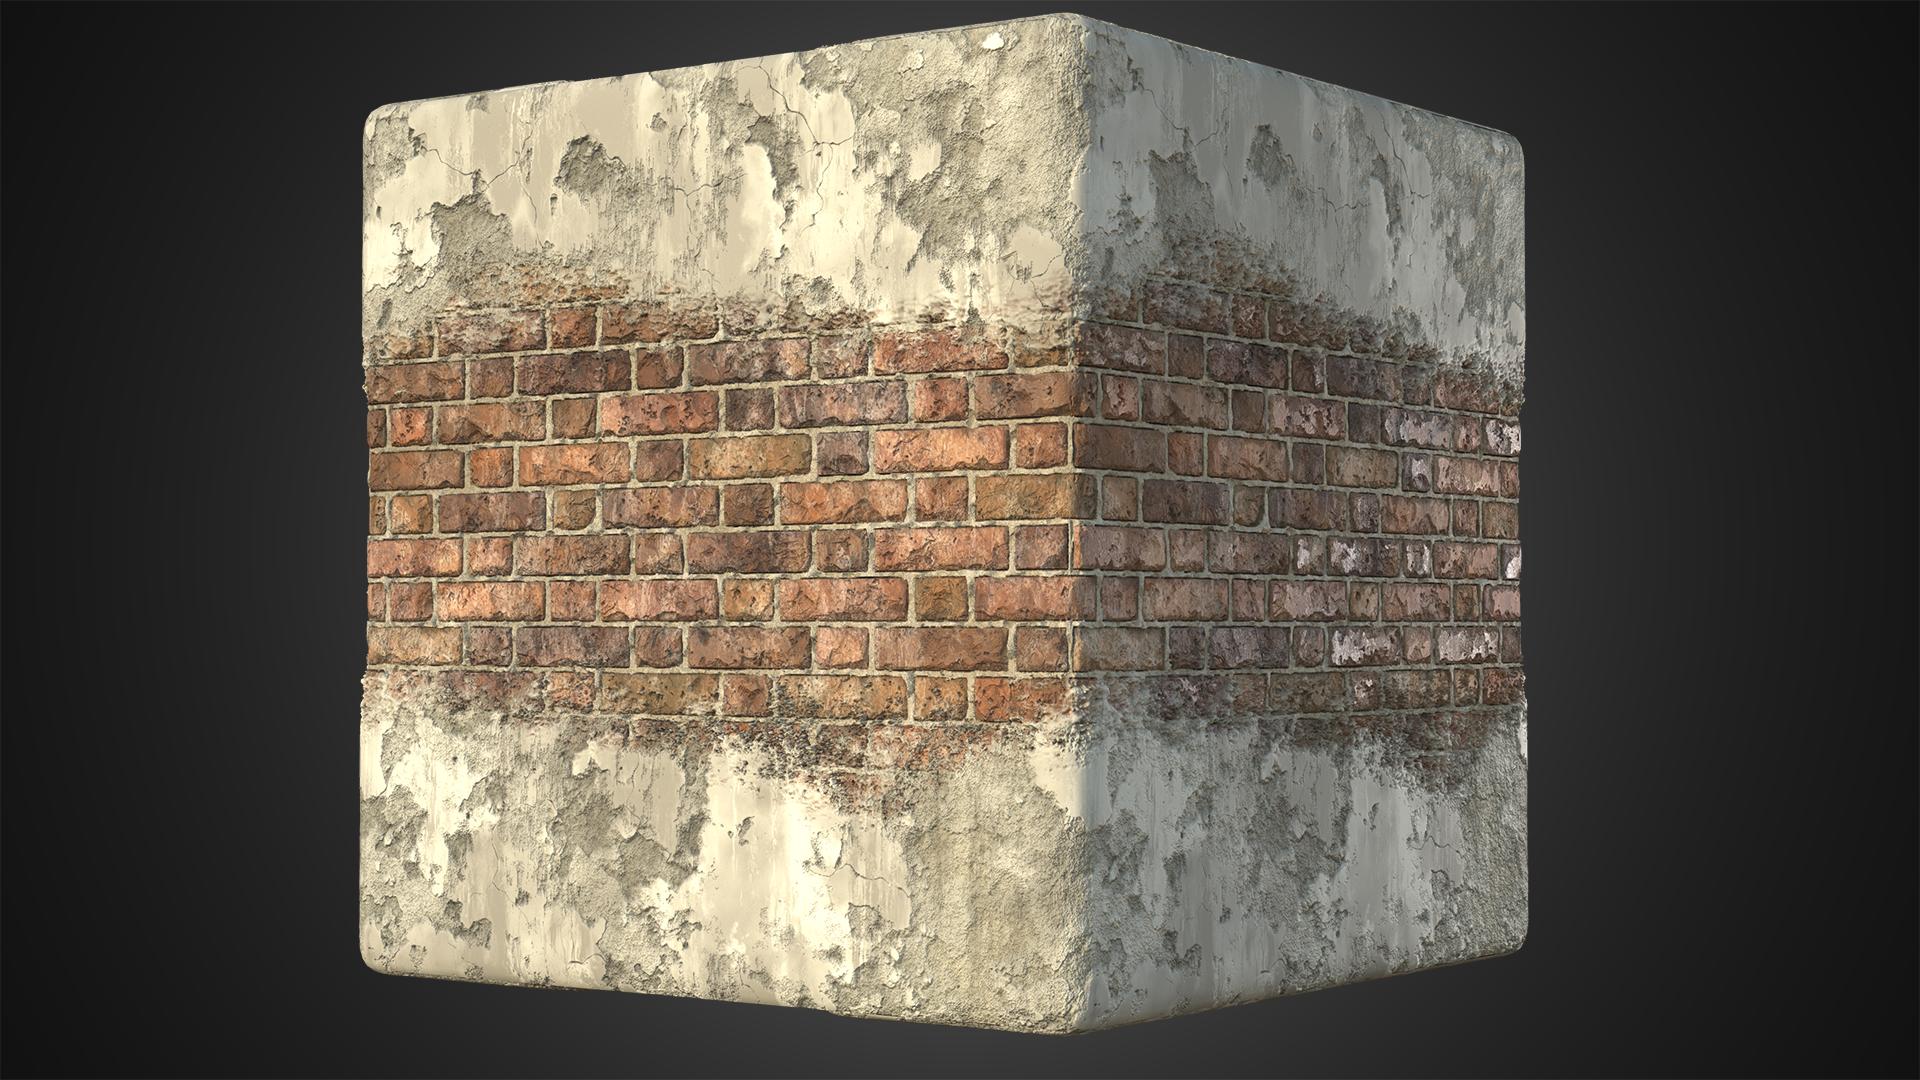 Brick Wall Plaster2 Cube